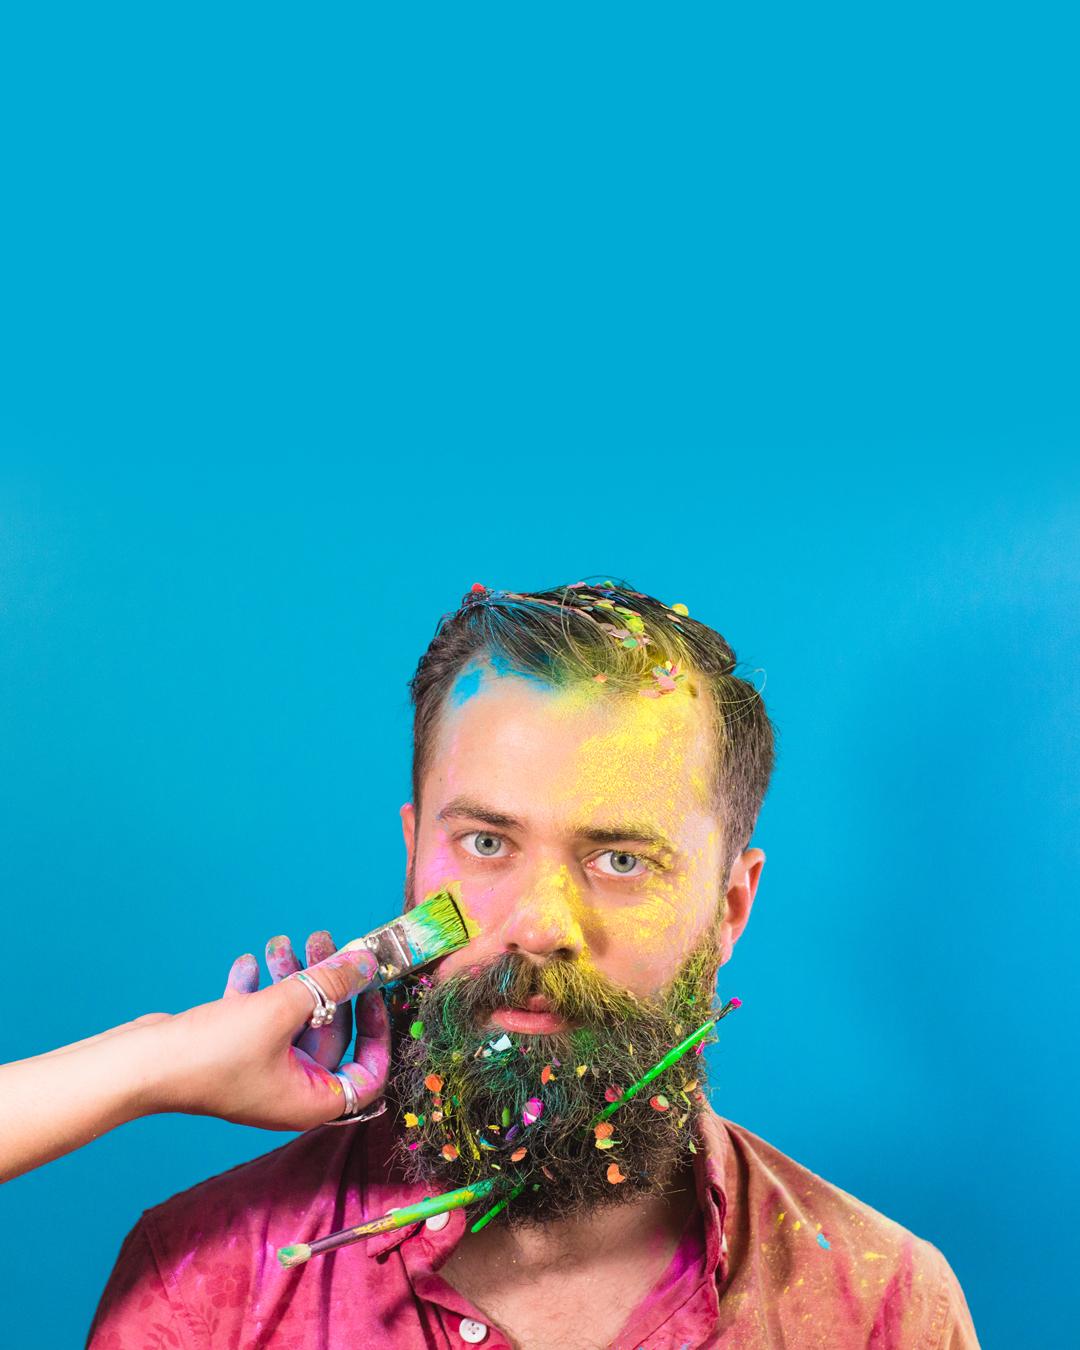 fiesta-beard-insta-post.JPG